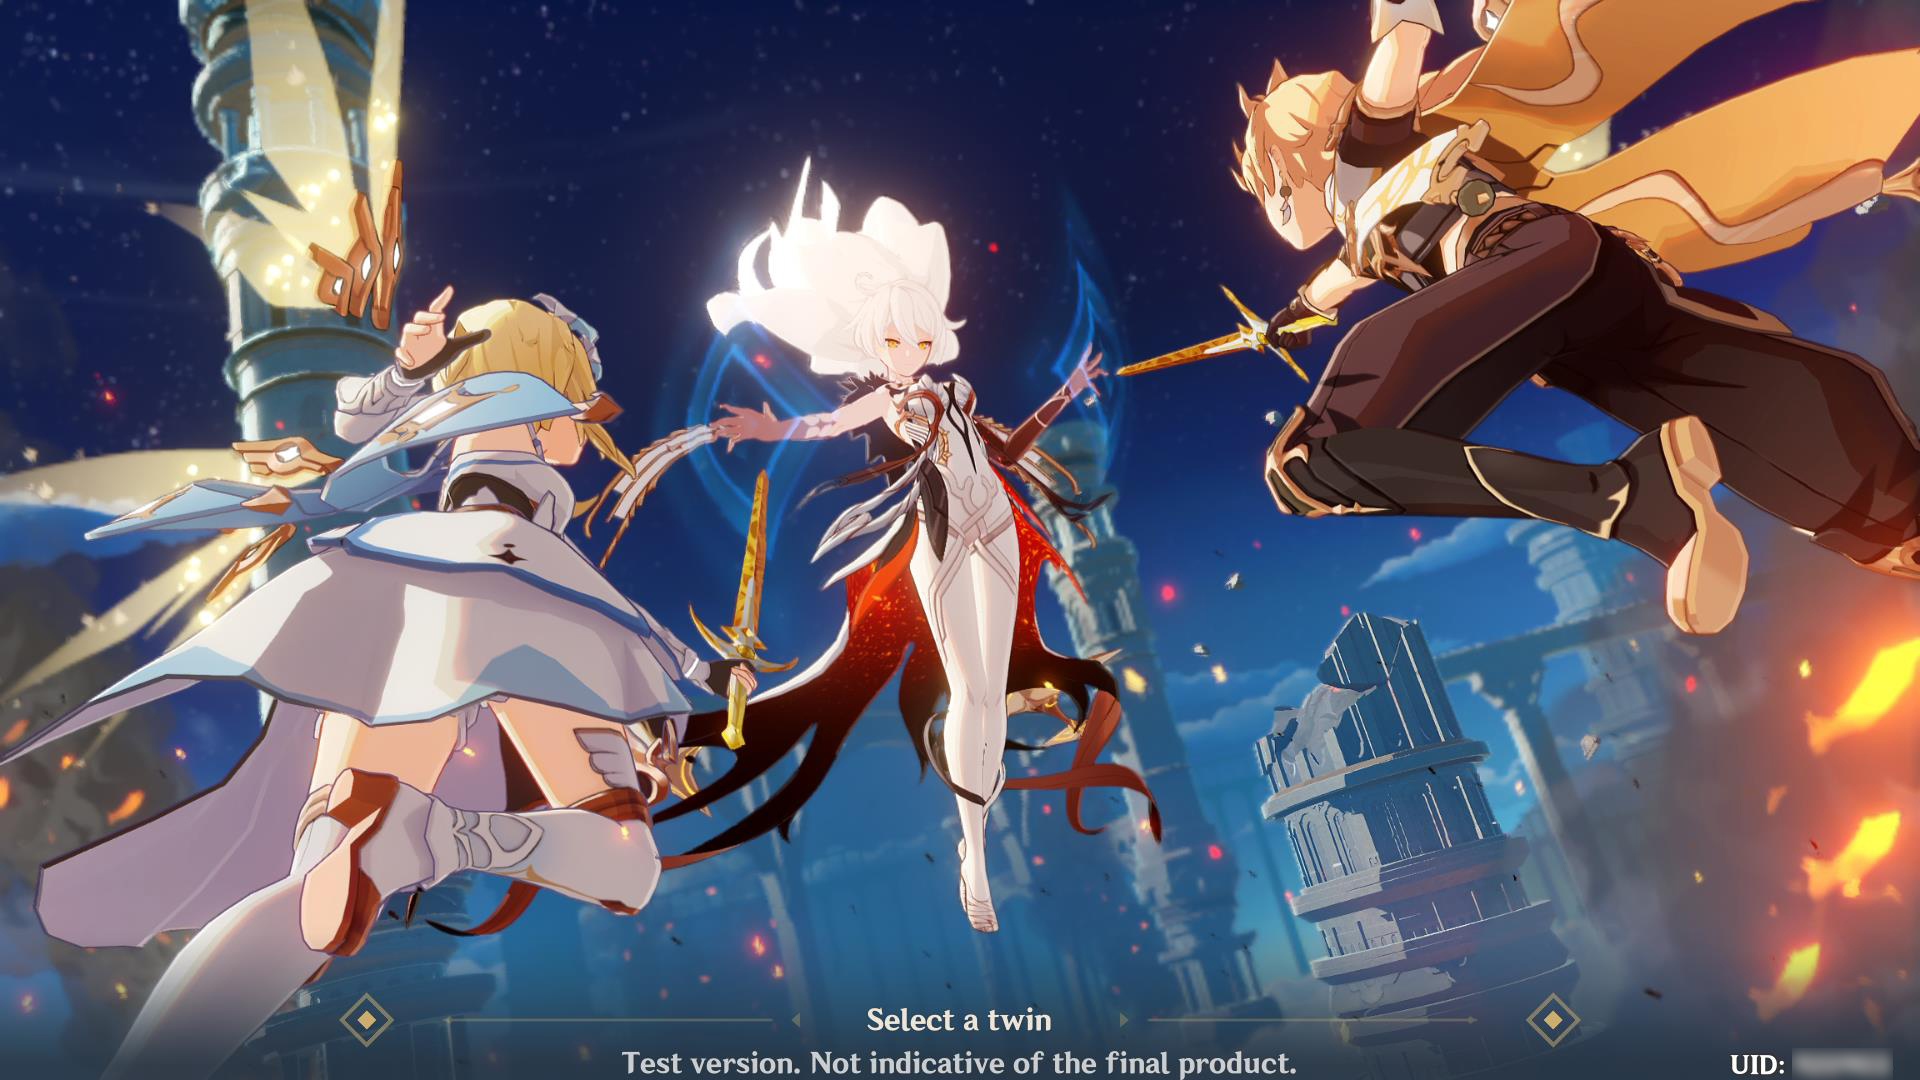 Genshin Impact Character select